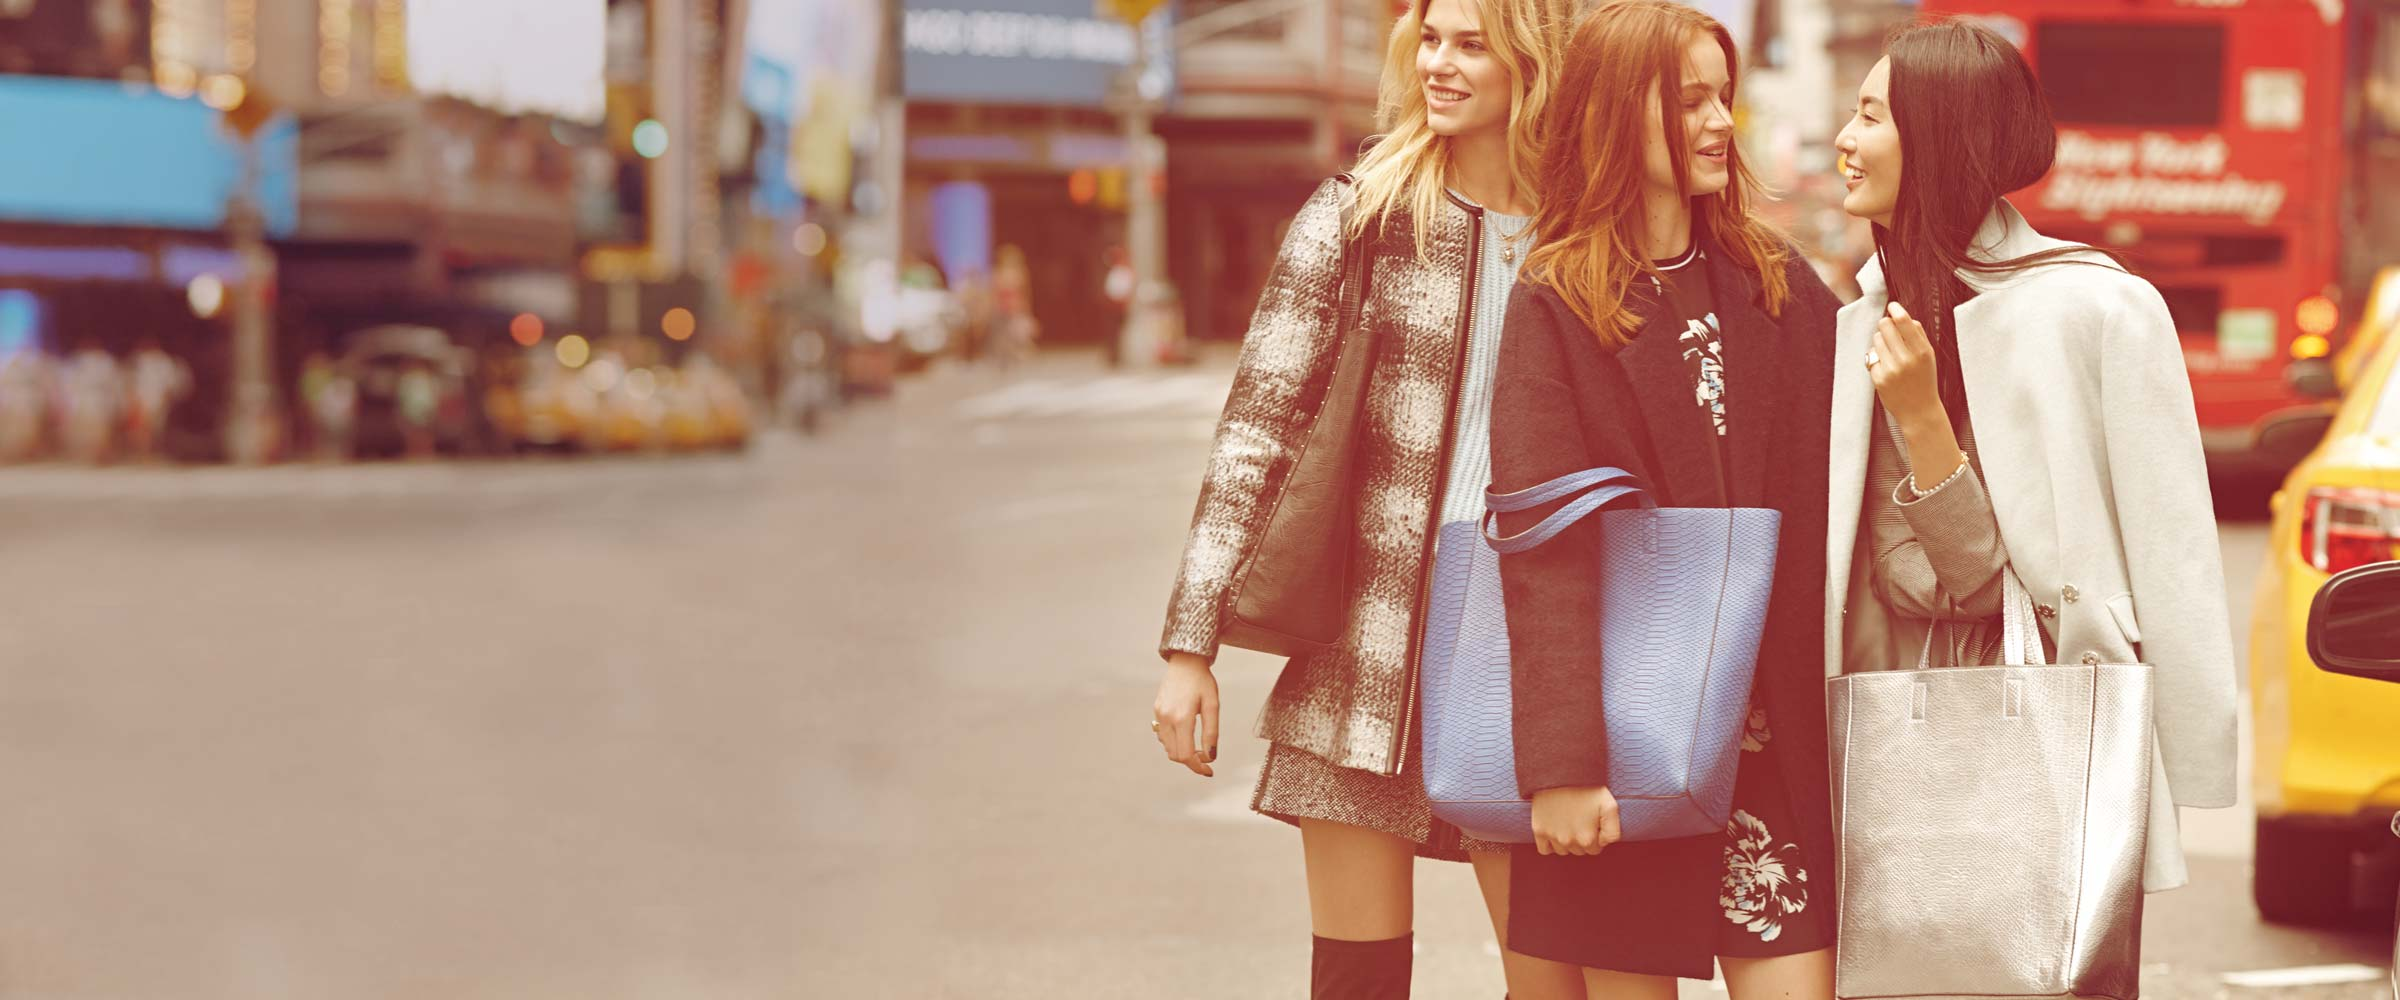 New Look | Vêtements mode femmes, hommes et ados en ligne